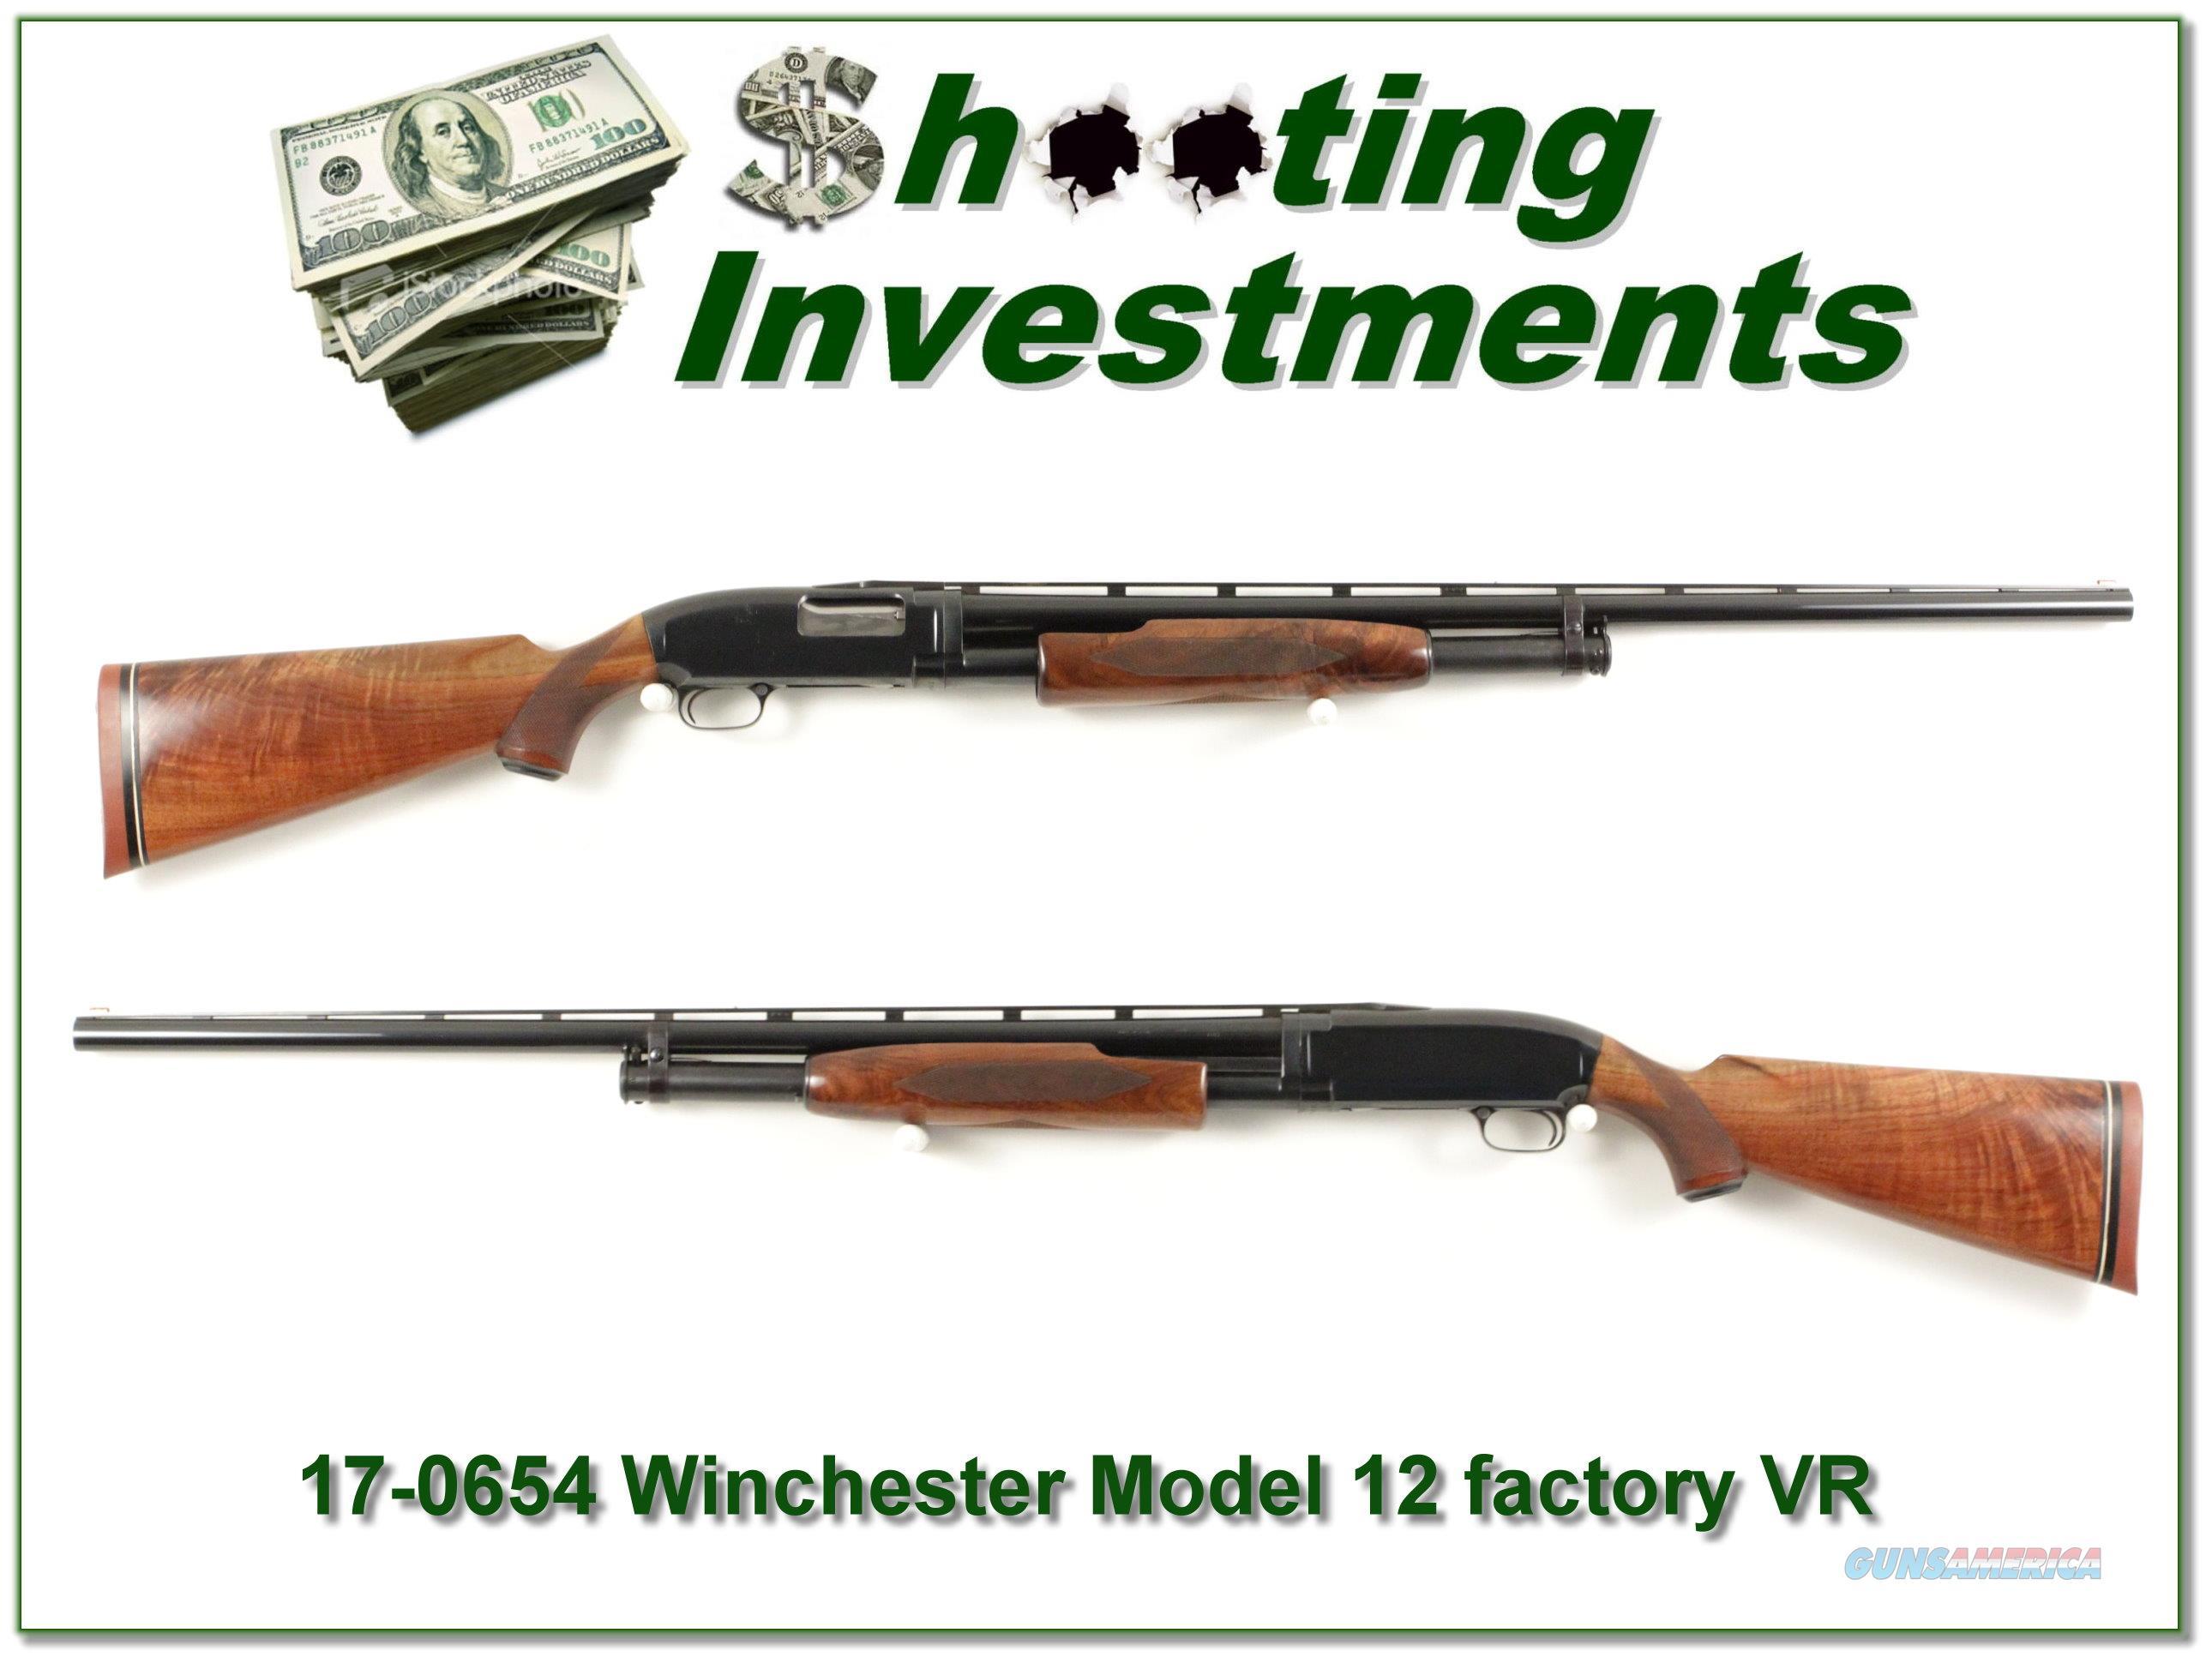 Winchester Model 12 Trap 1962 Factory Vent Rib!  Guns > Shotguns > Winchester Shotguns - Modern > Pump Action > Trap/Skeet